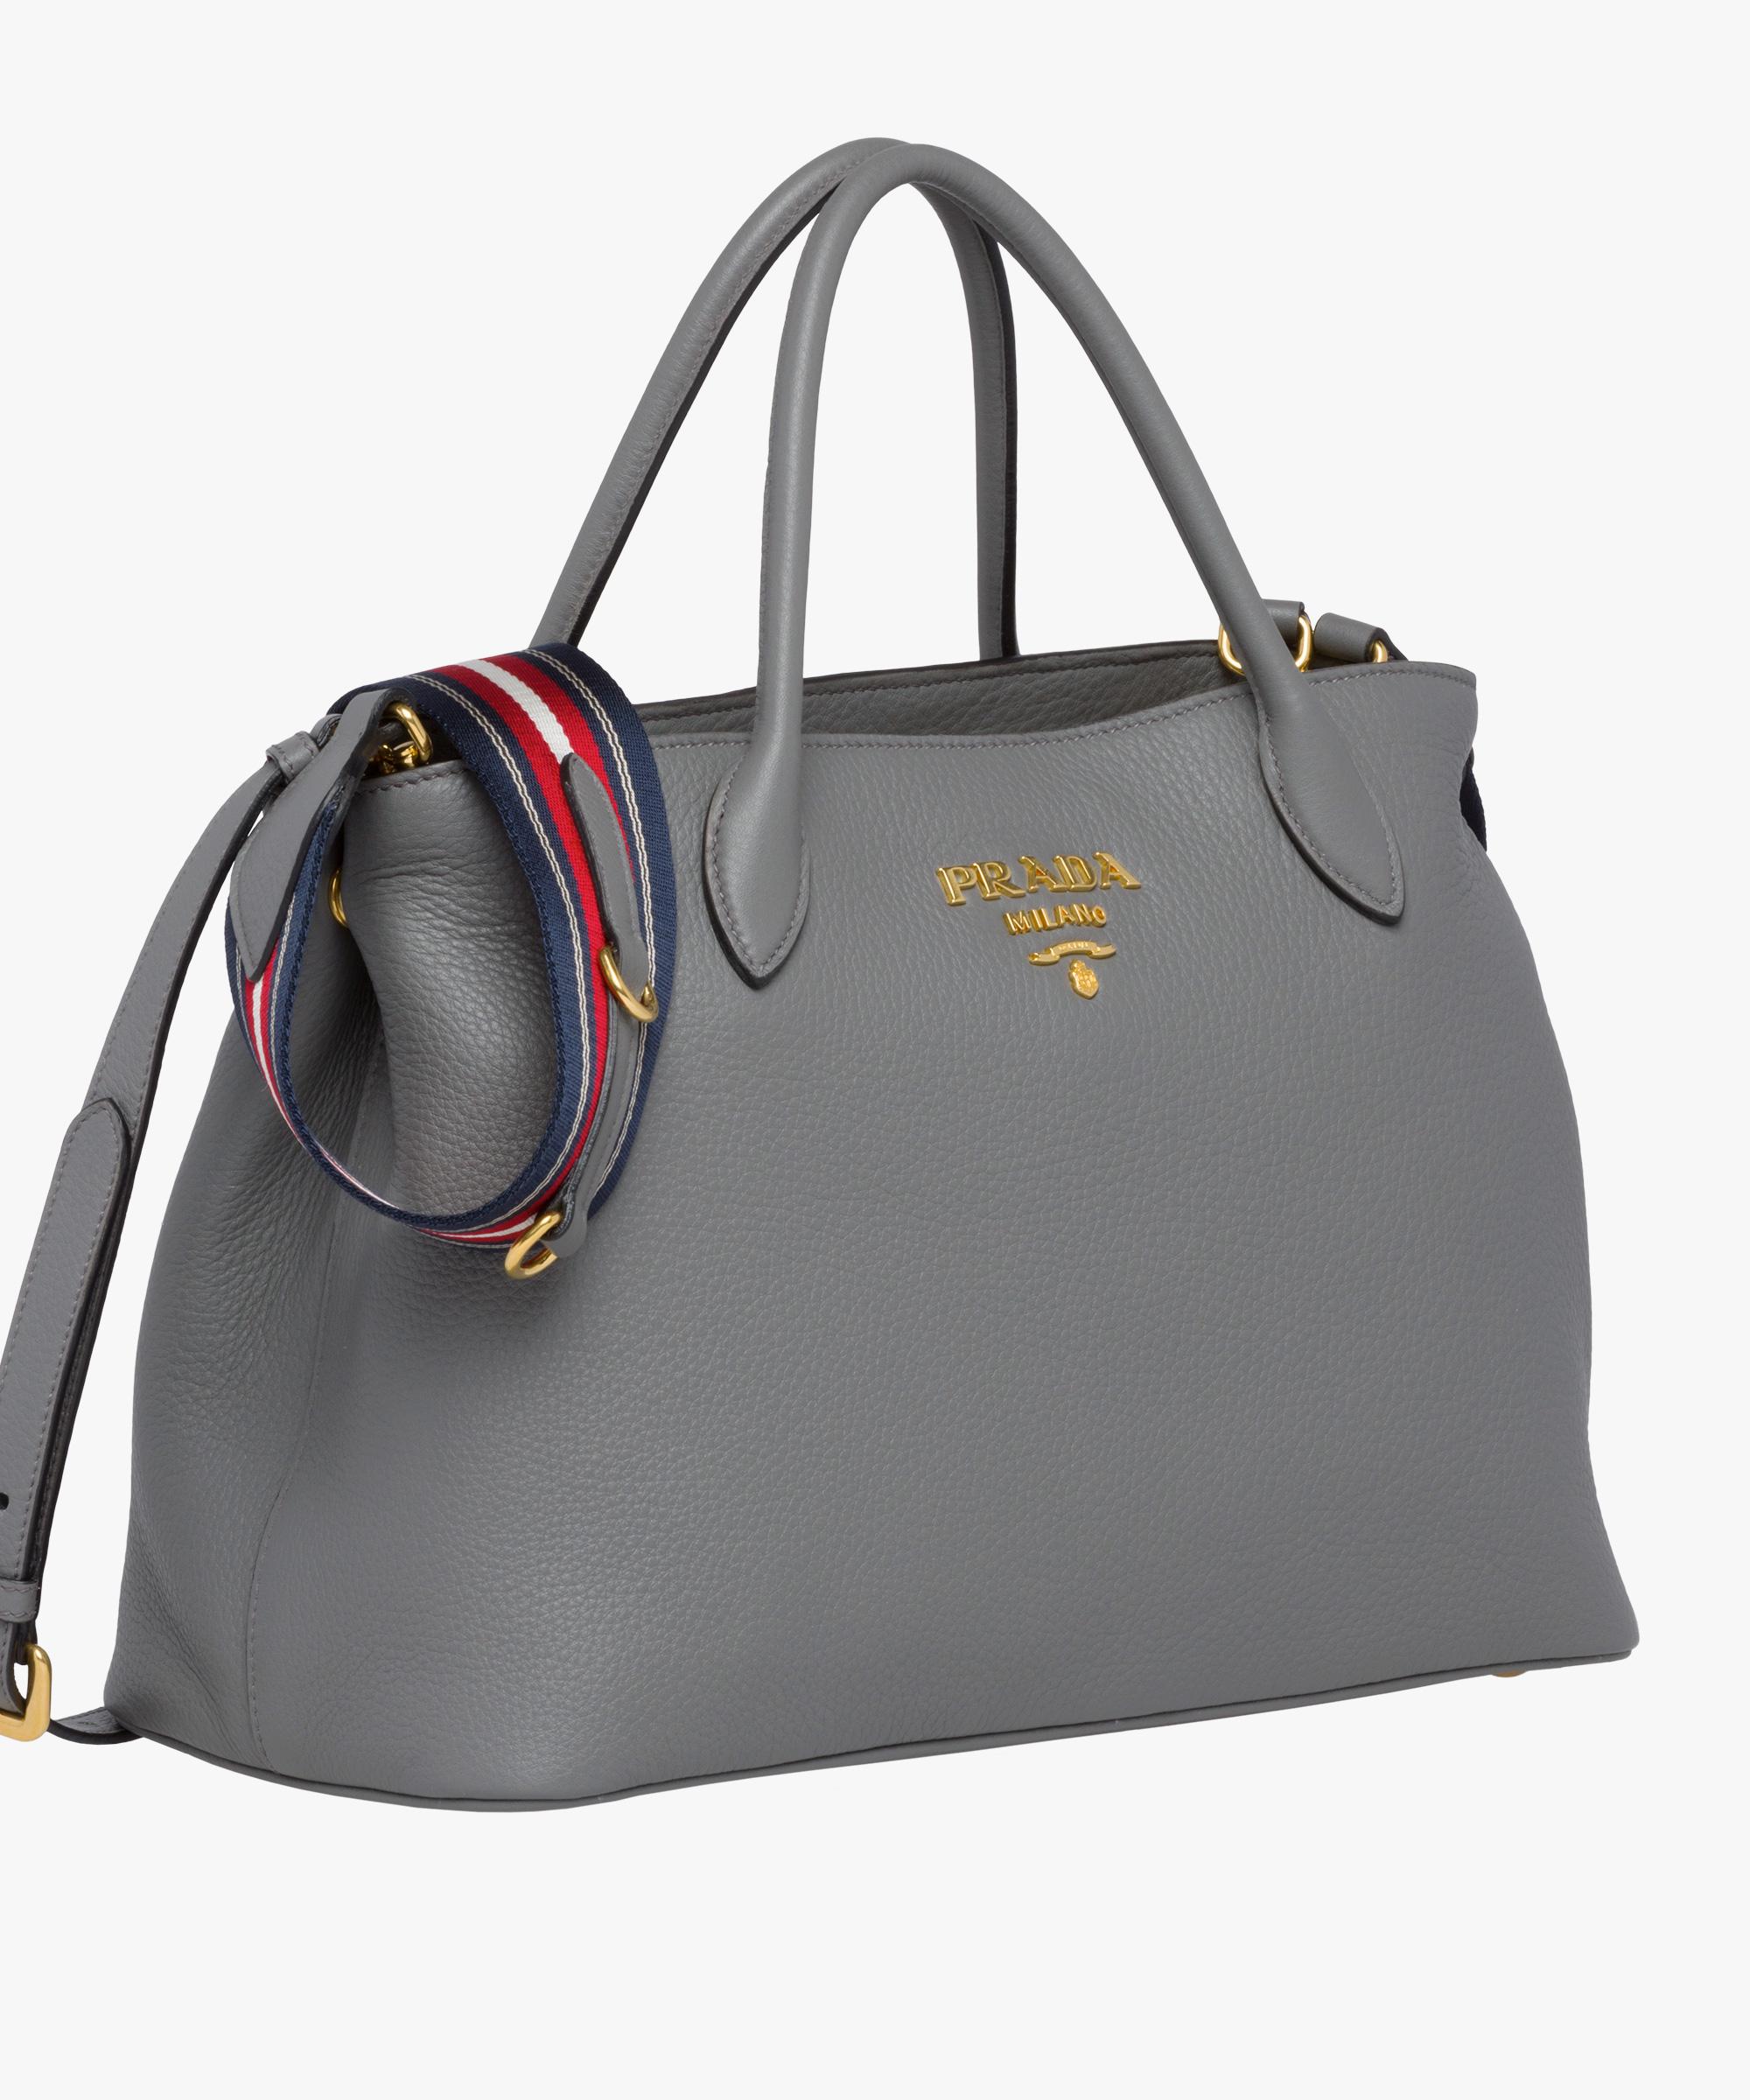 588fedee8f59 ... Calf leather bag Prada MARBLE GRAY ...